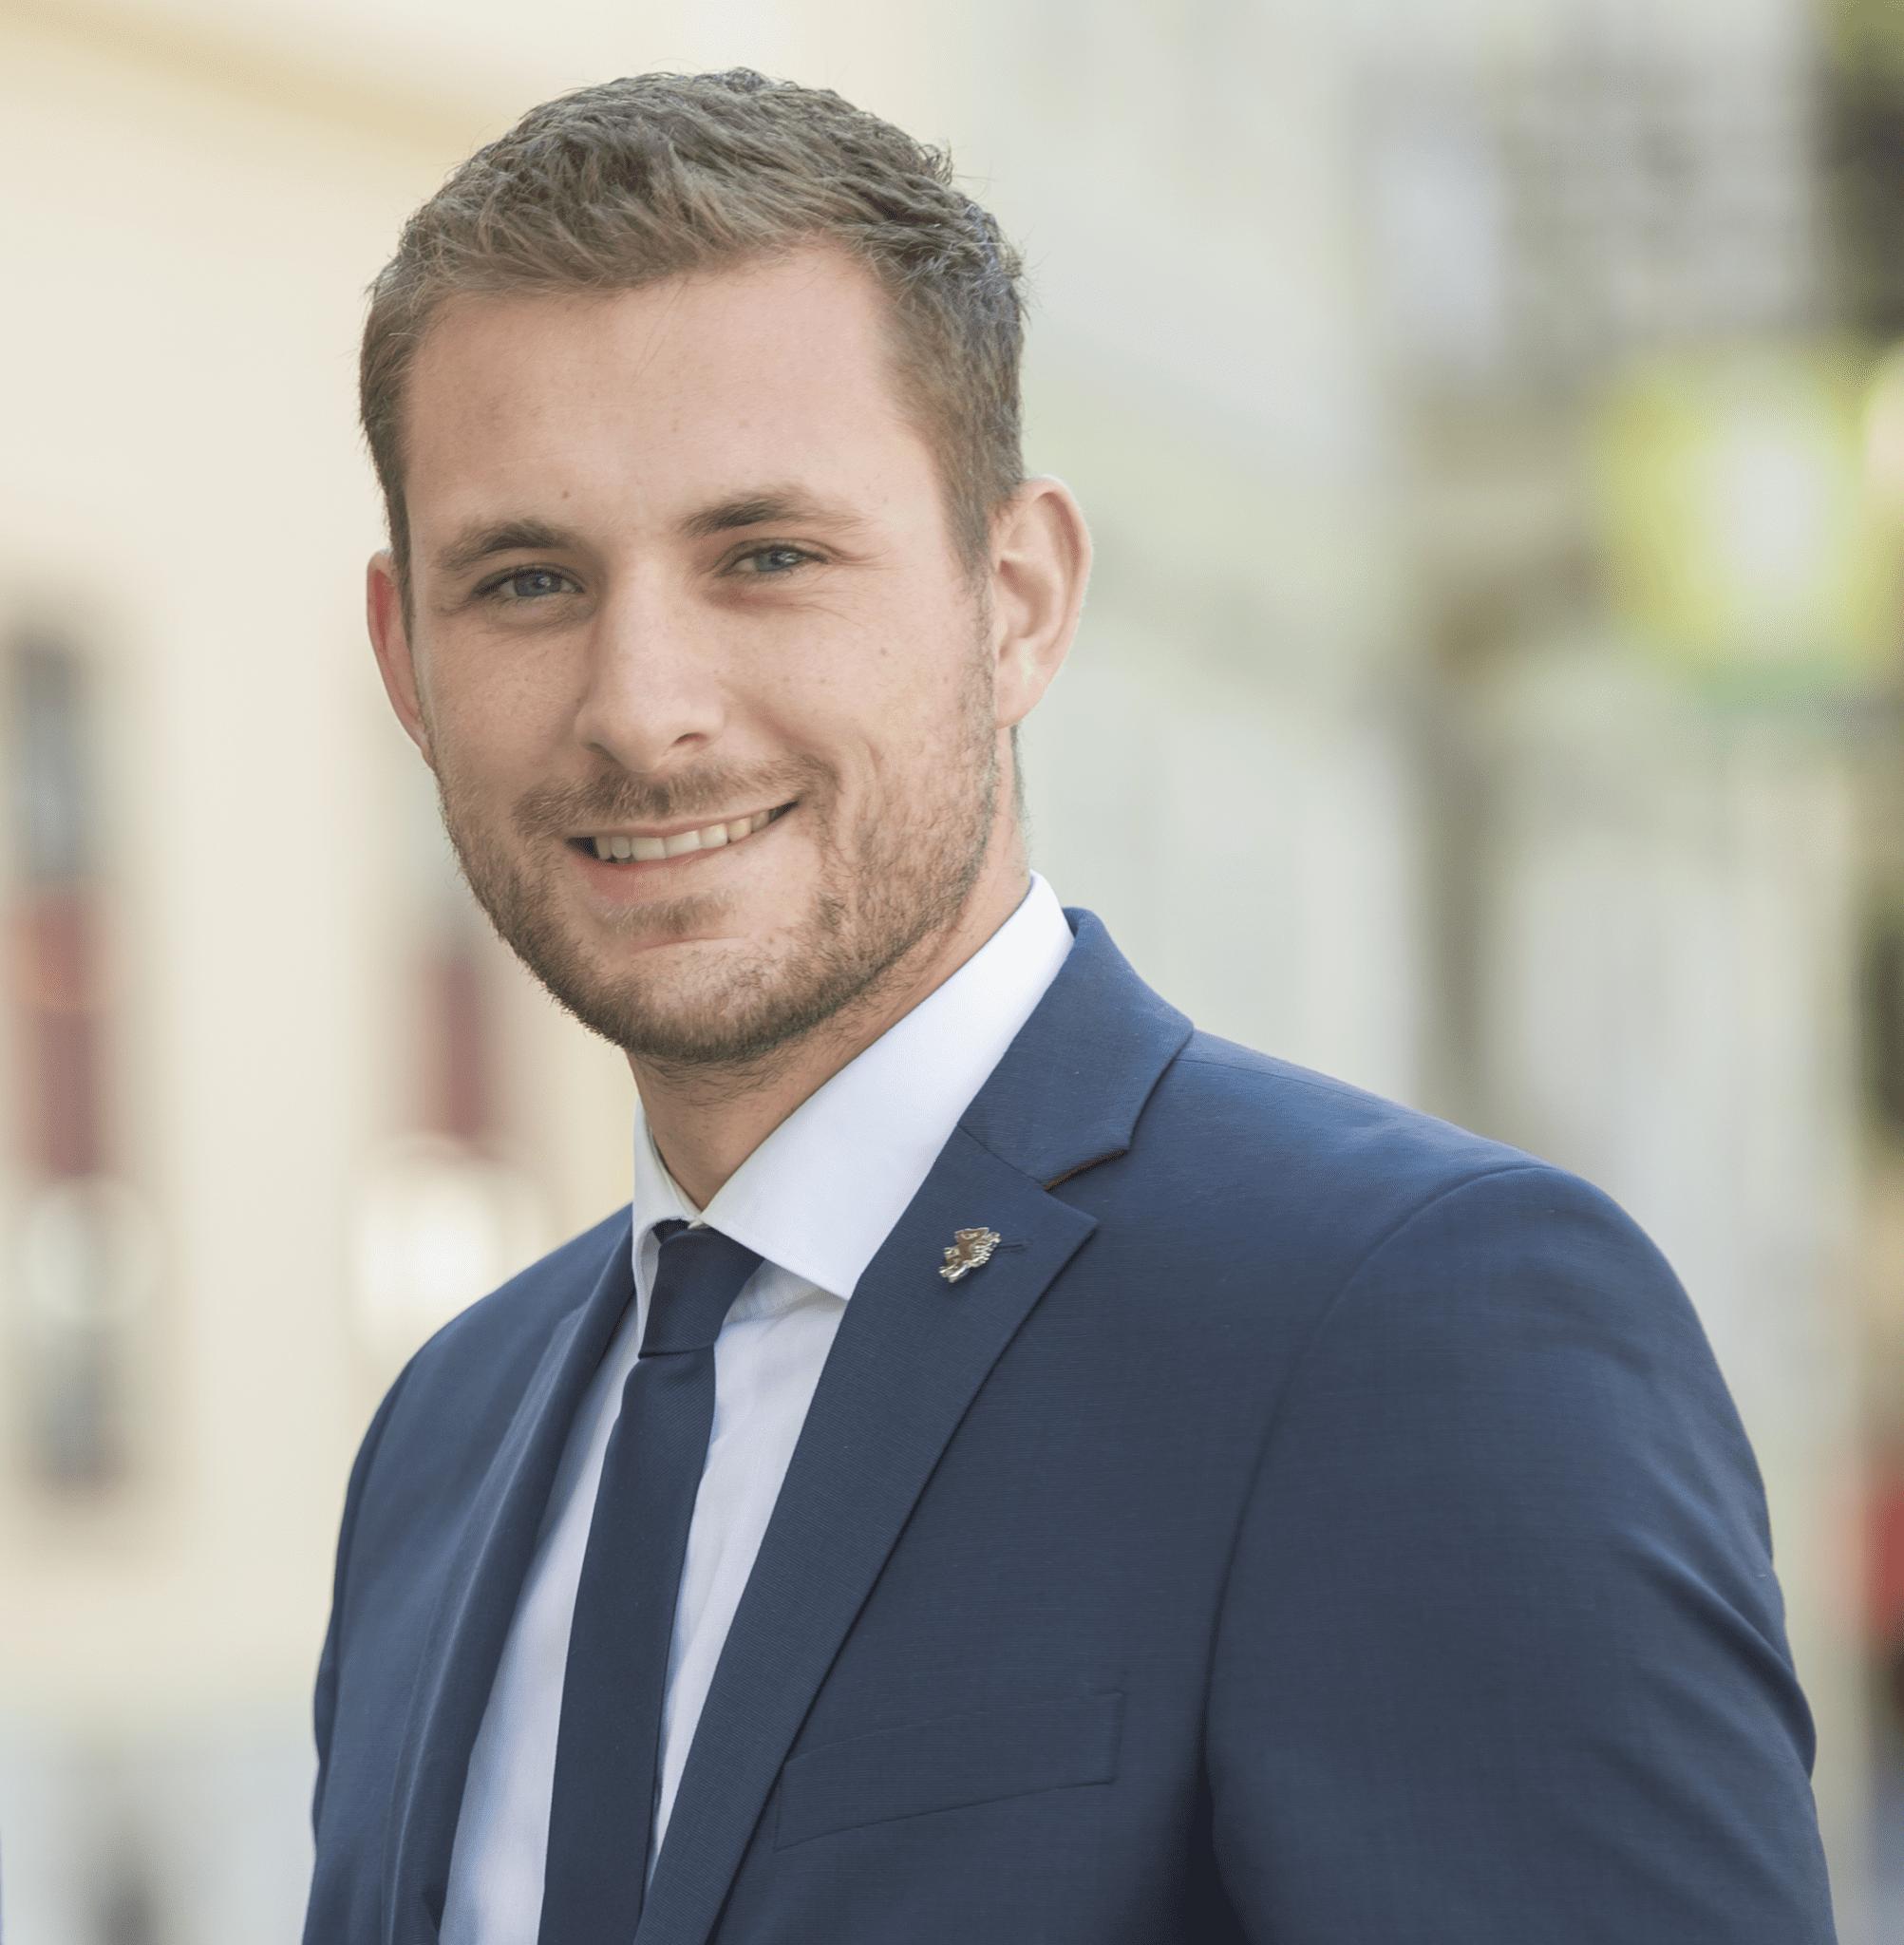 Dr. Matthias Pokorn